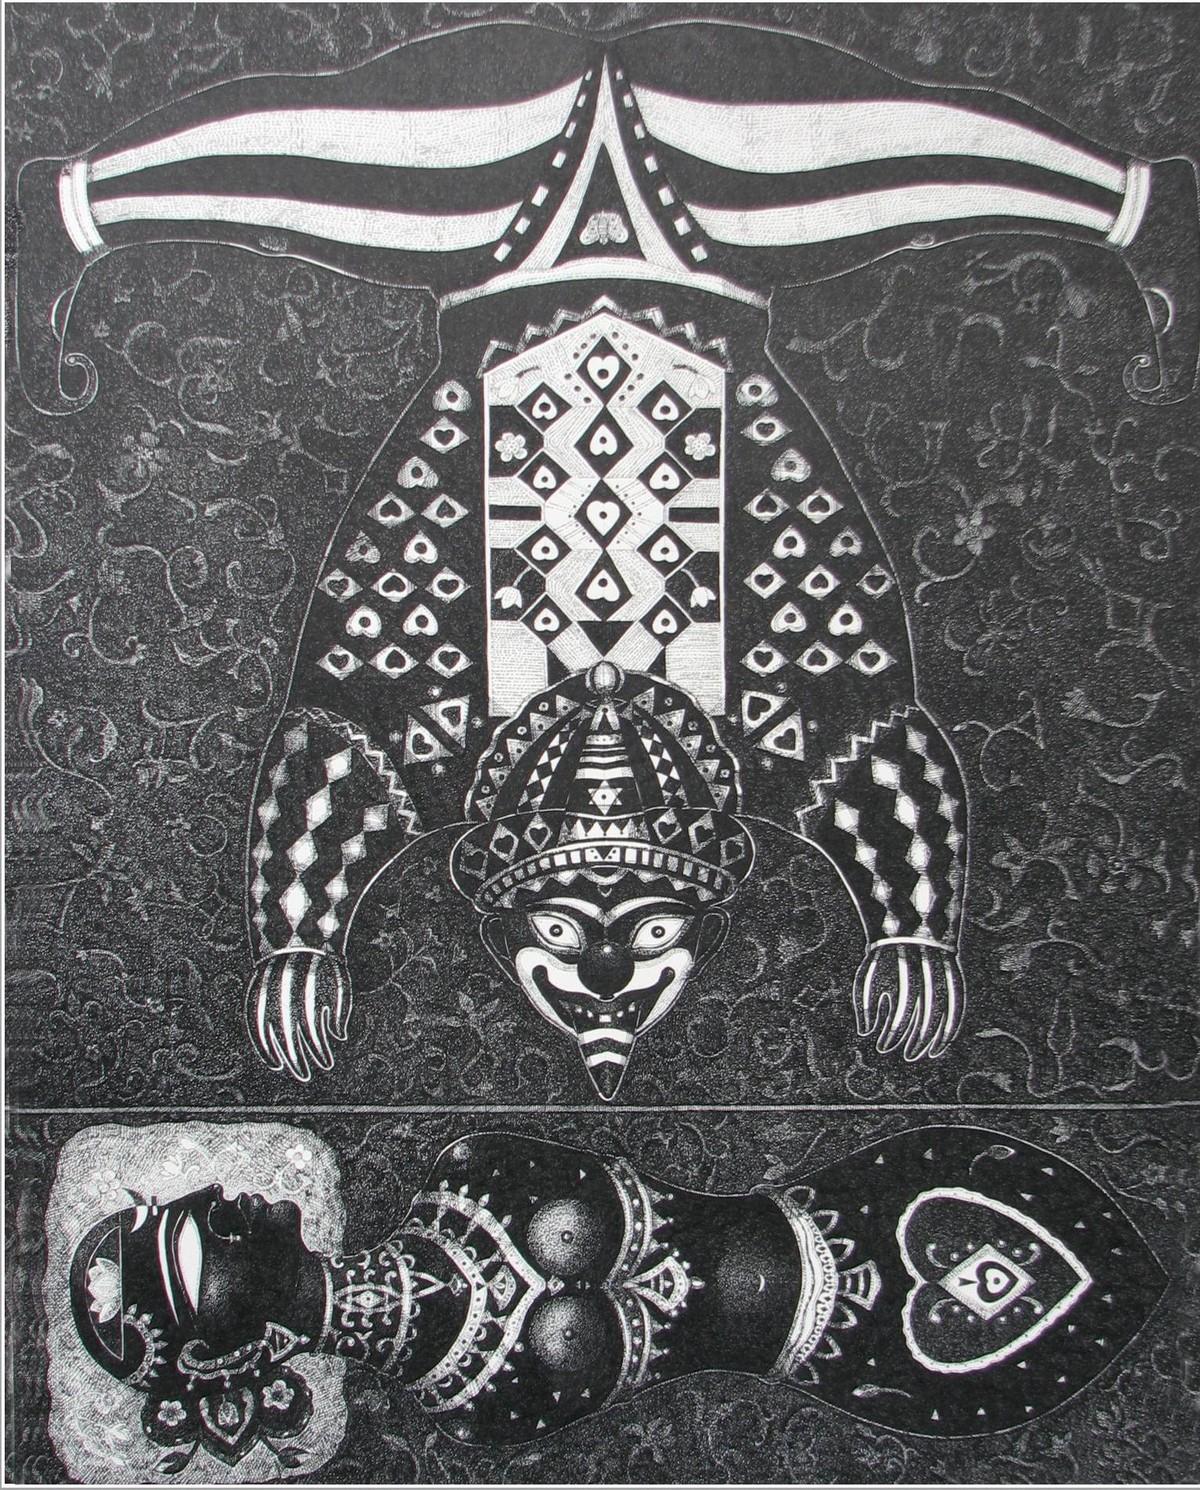 Clown 1 by Bhaskar Lahiri, Illustration Drawing, Pen & Ink on Paper, Gray color